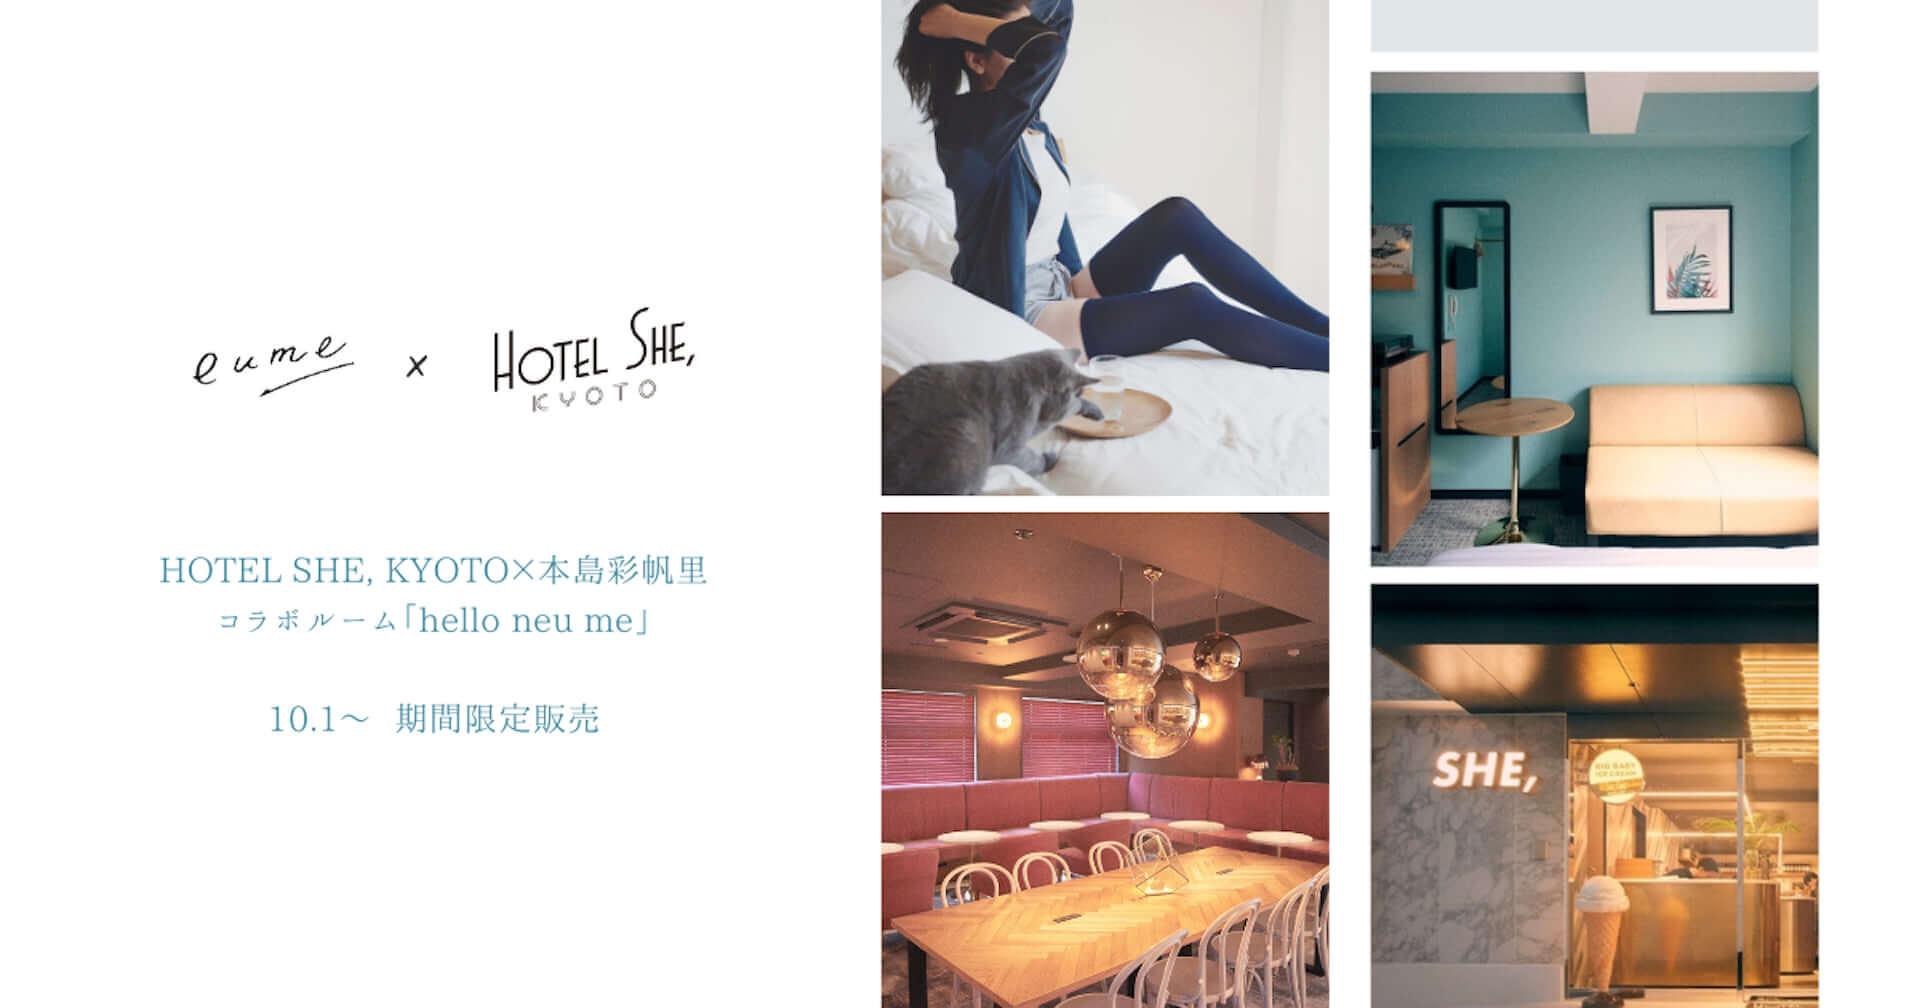 「HOTEL SHE, KYOTO」で極上のセルフケア宿泊体験ができる『hello, neu me』がスタート!「eume」プロデューサー・本島彩帆里のセレクトアイテムもプレゼント art201002_hotelshekyoto_2-1920x1008